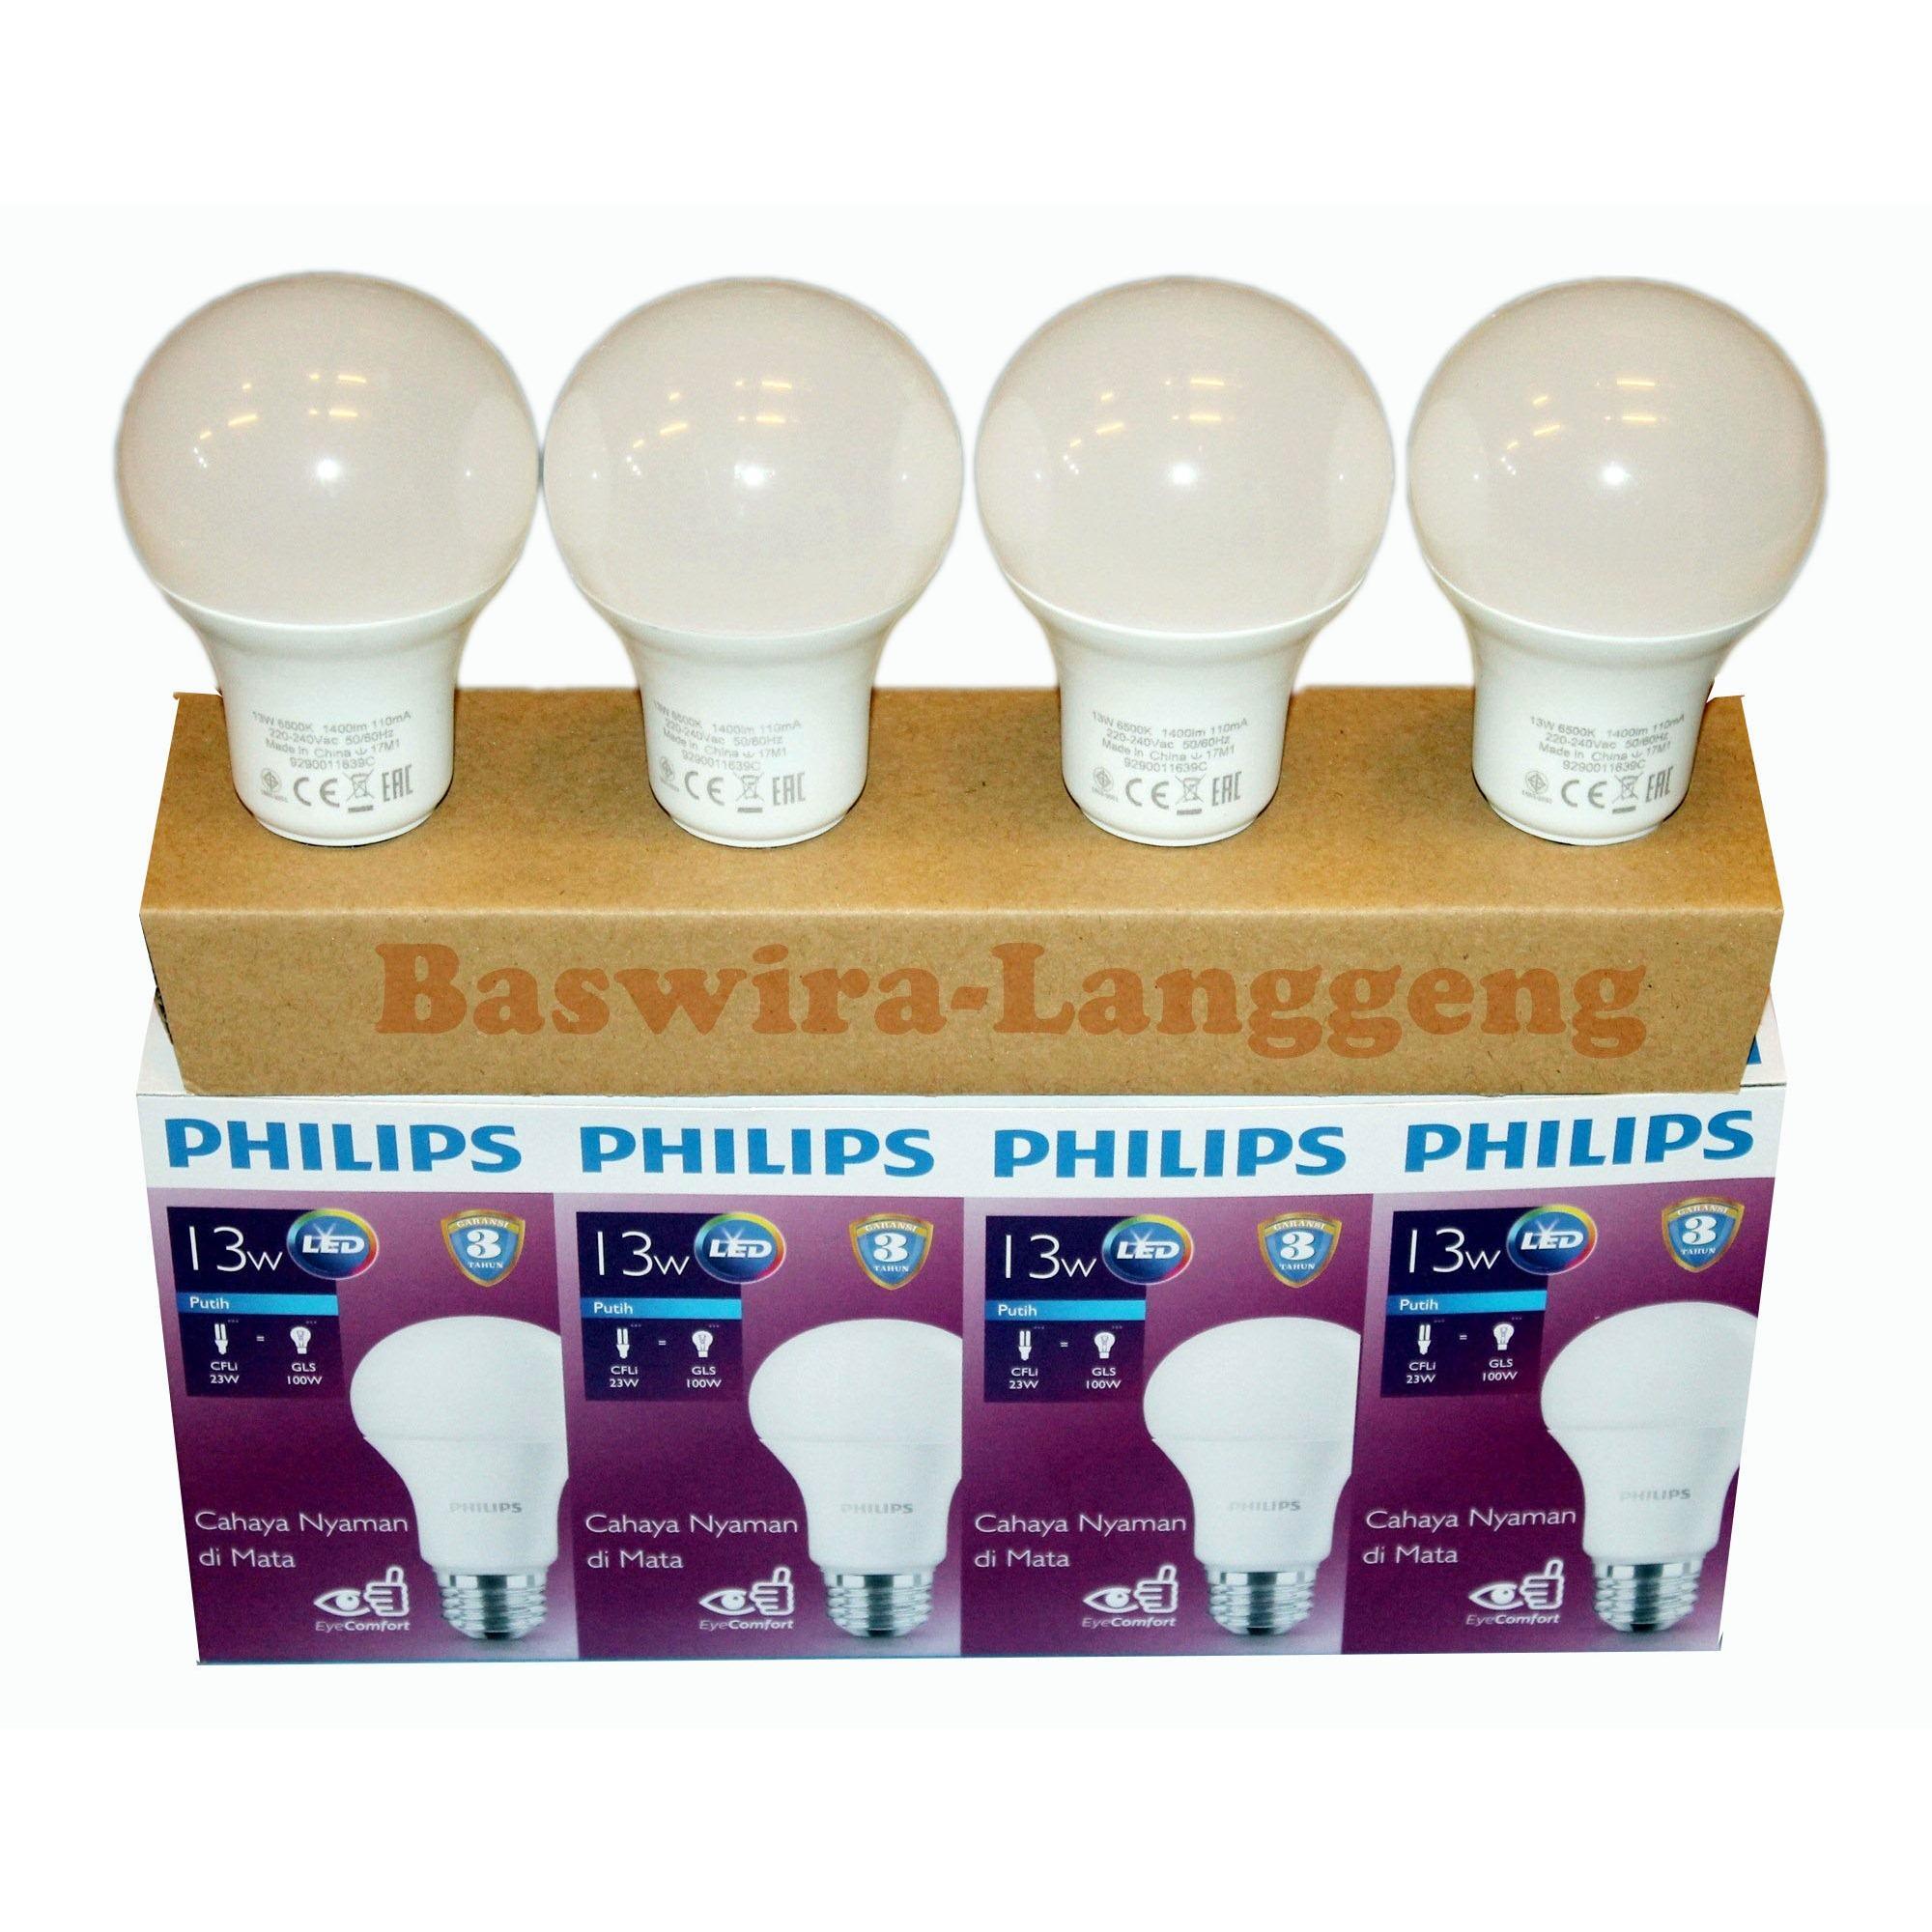 Paket Lampu Led Philips 13w 13watt Promo Unicef Beli 3 Gratis 1 Bulb 13 Watt 6500k Gambar Produk Rinci Terkini